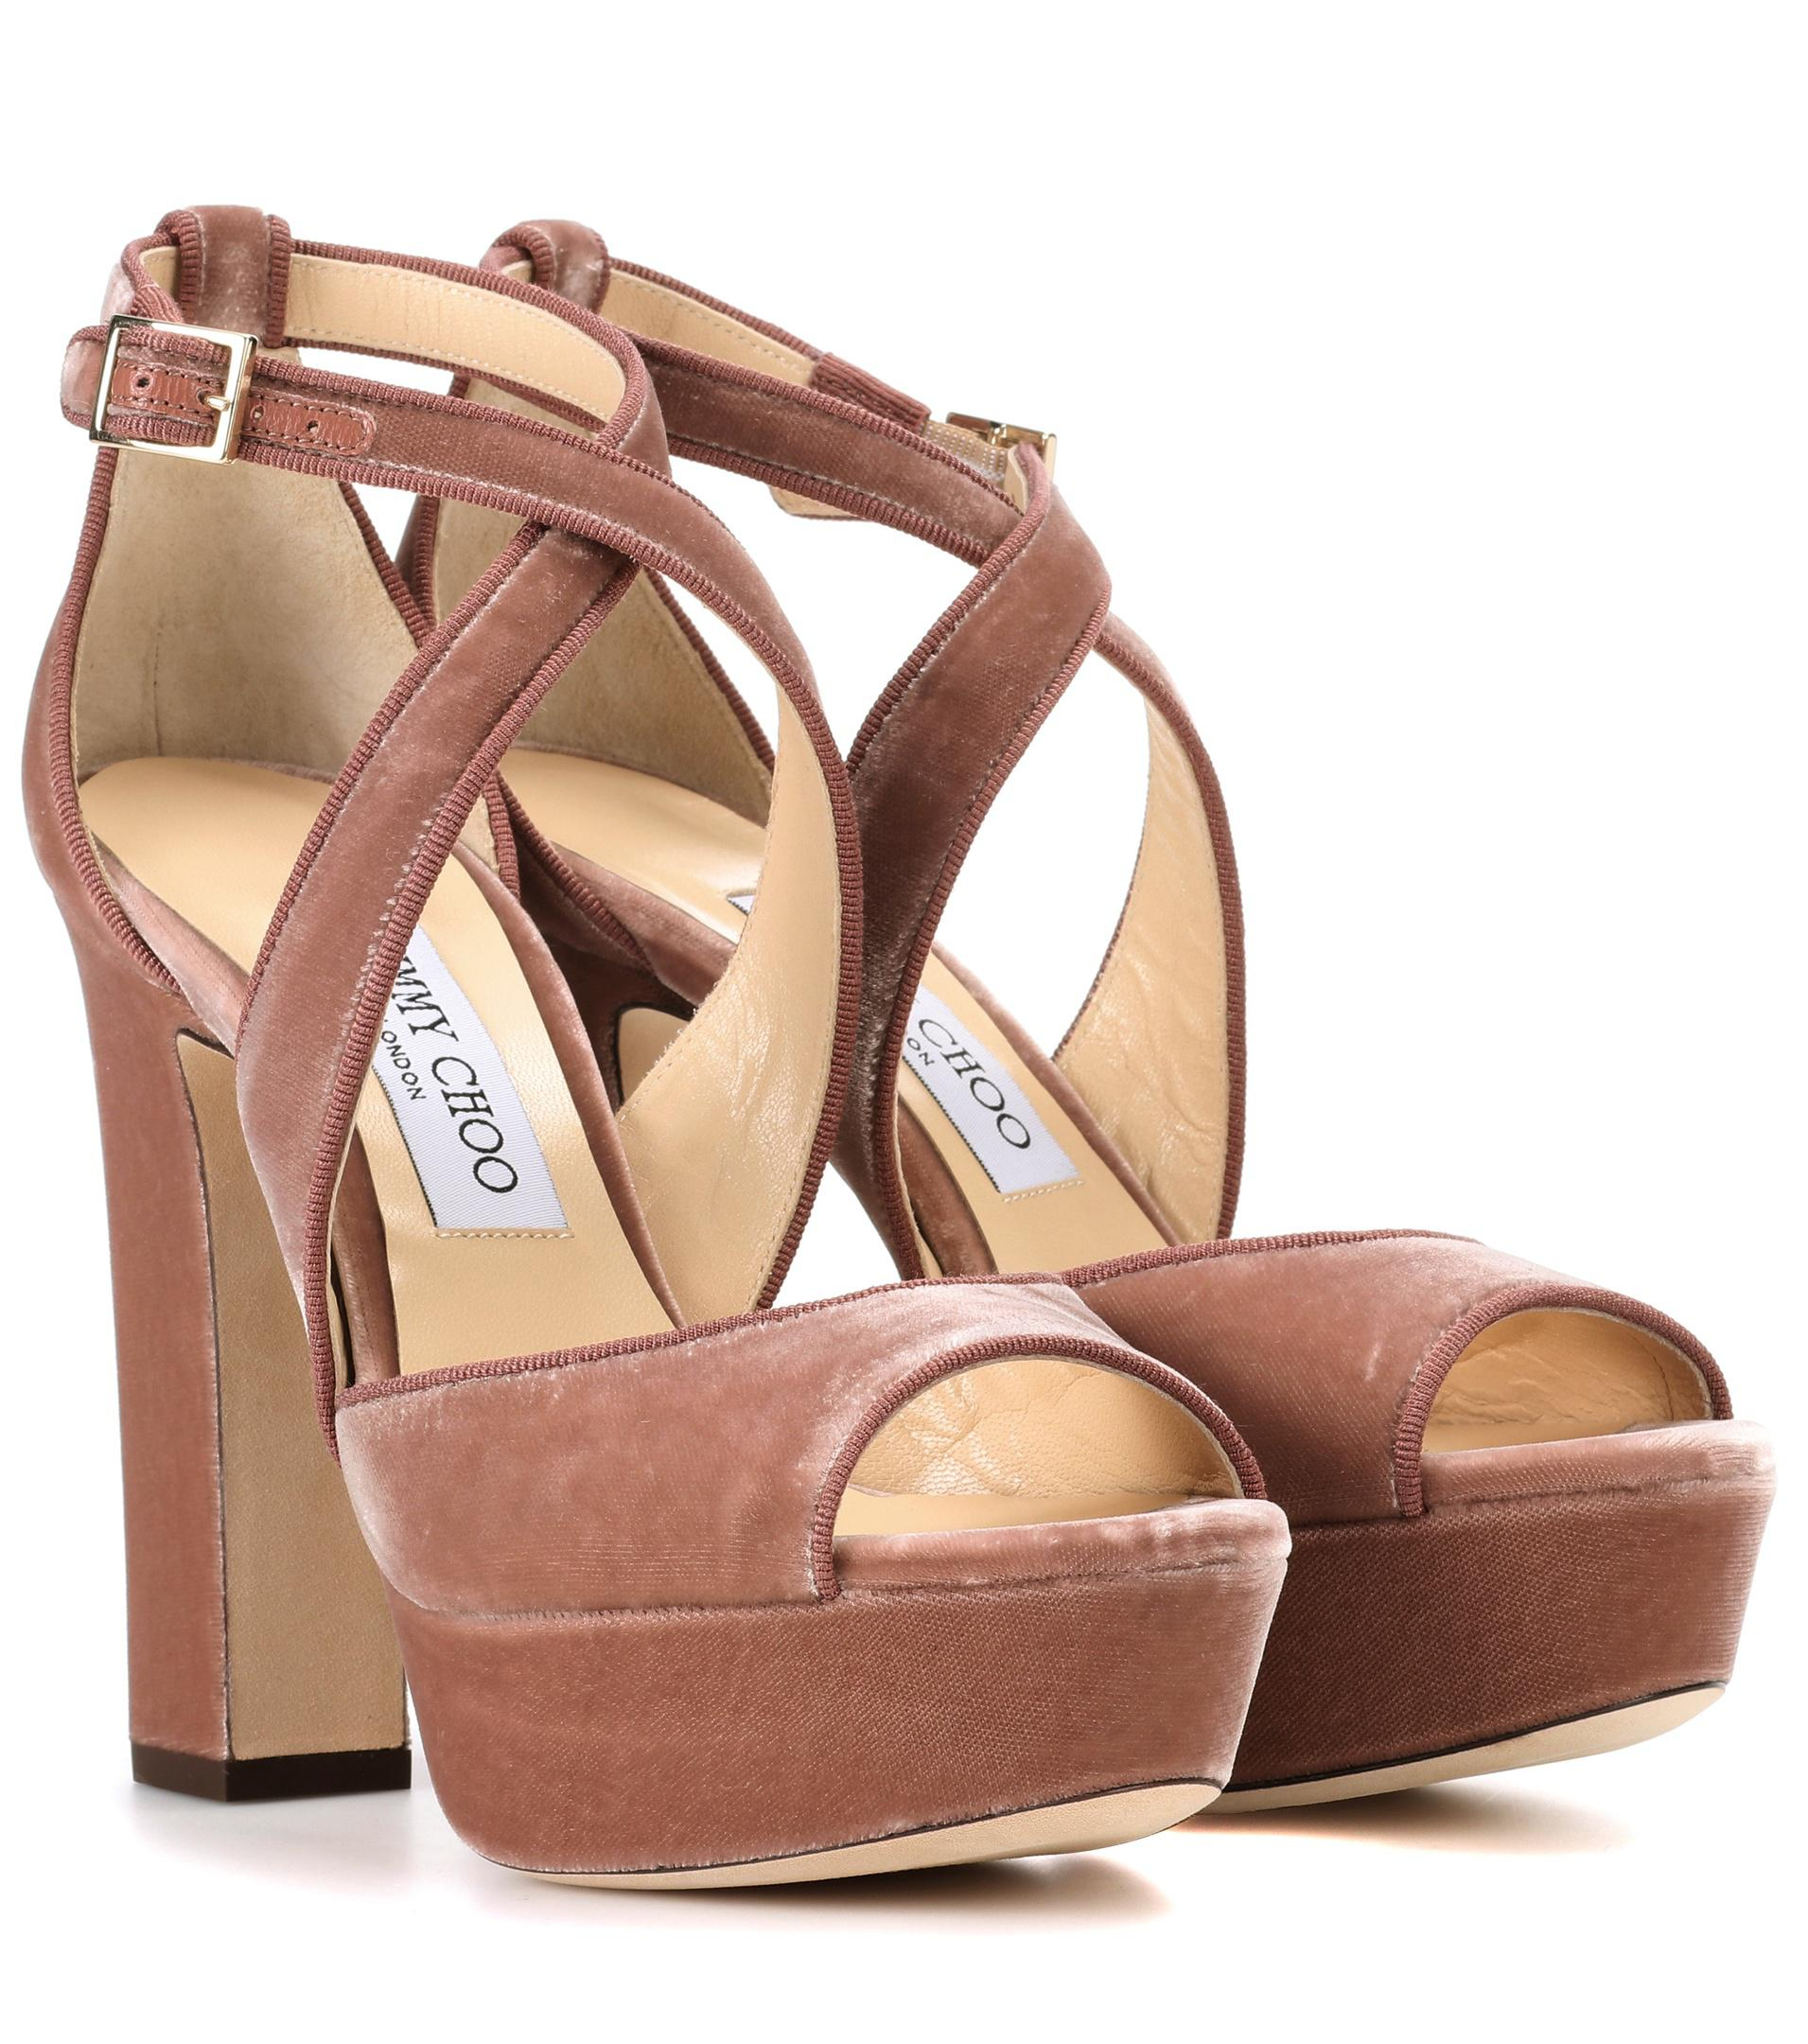 aaef5368397 Jimmy Choo April Platform Sandal - Lyst